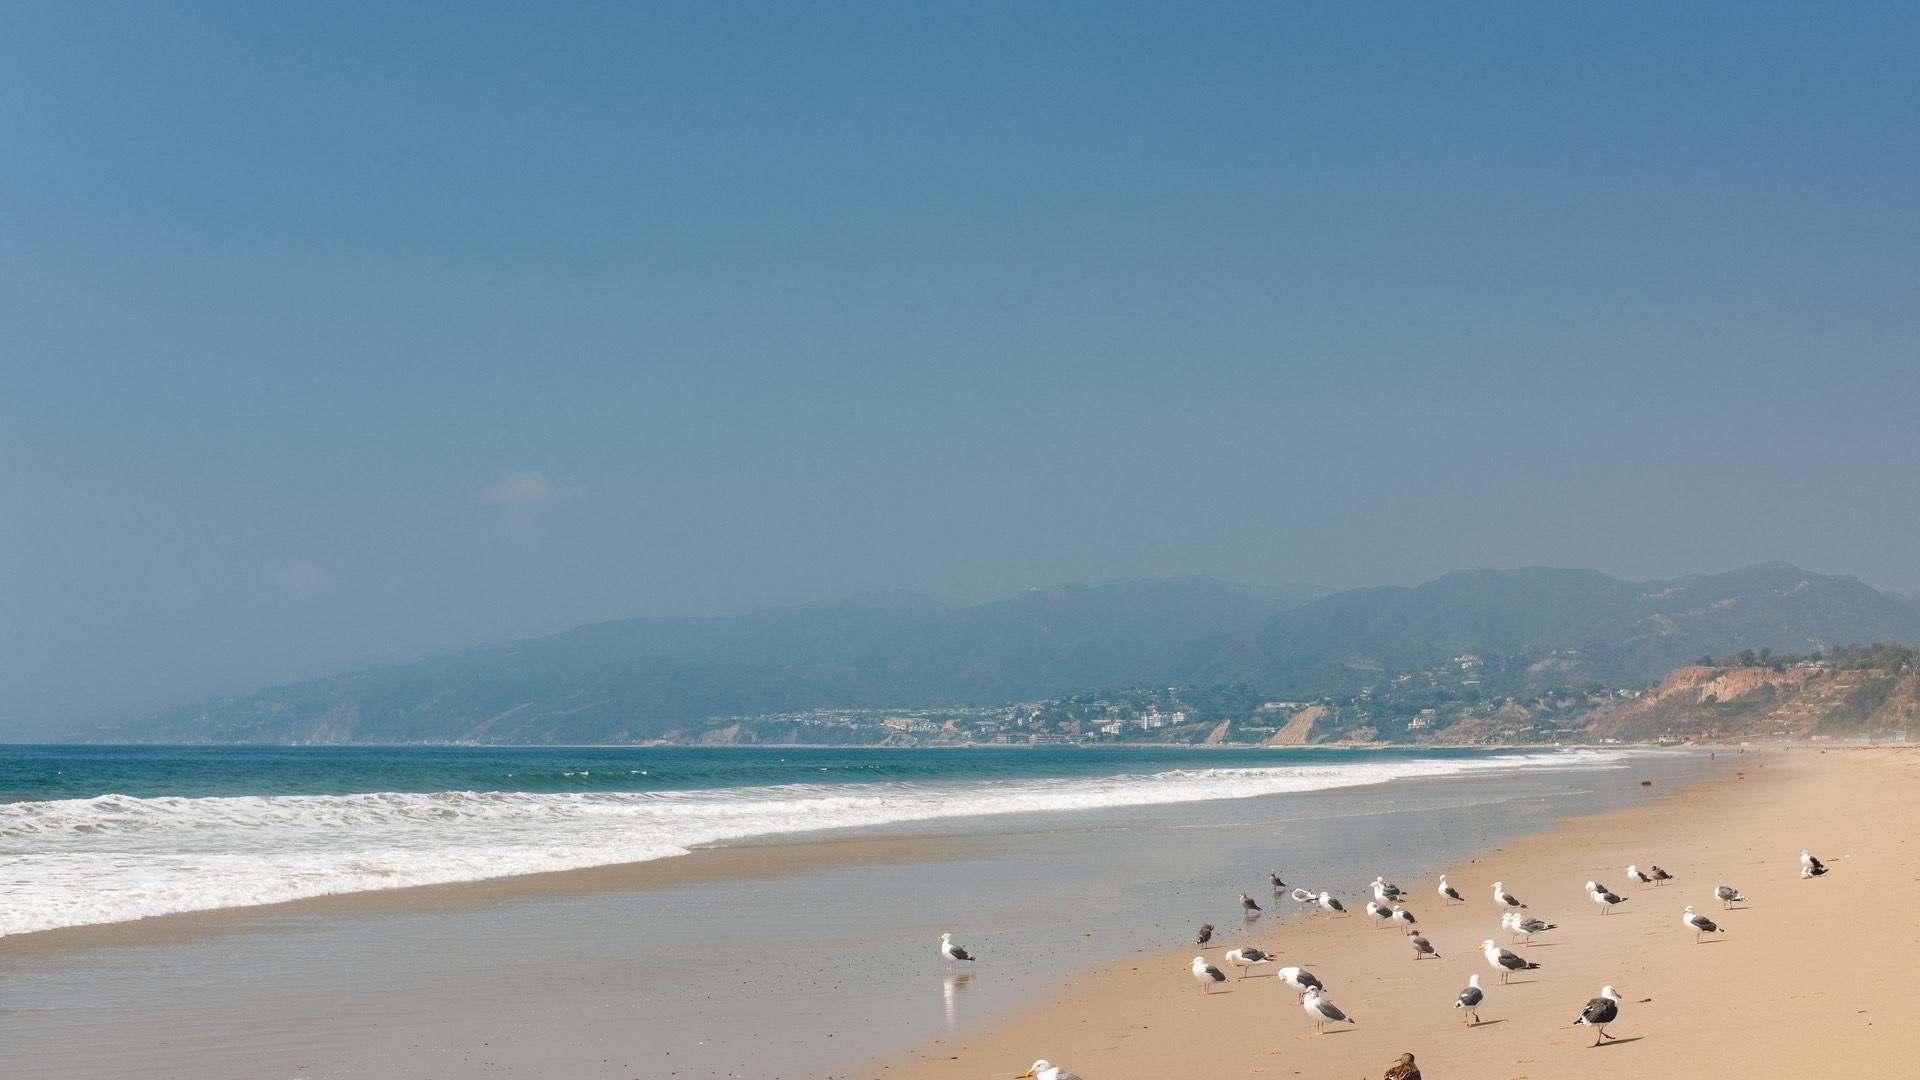 USA | Santa Monica  | ©SergiyN/Shutterstock.com